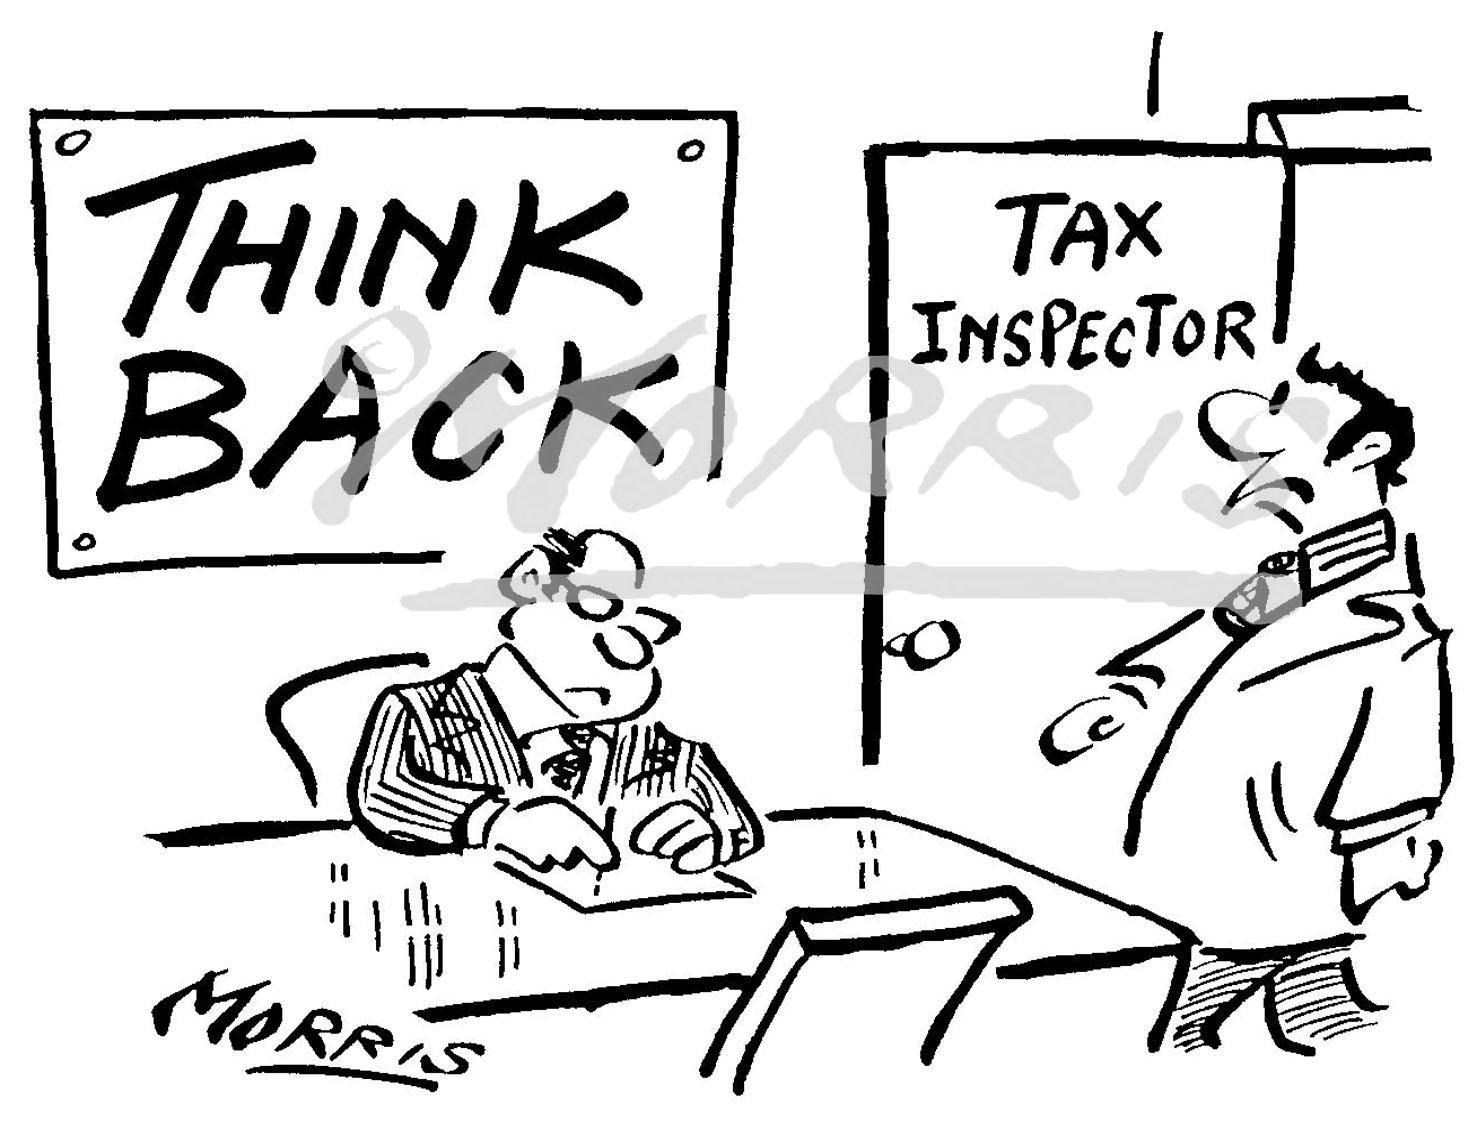 Taxation cartoon – Ref: 3422bw